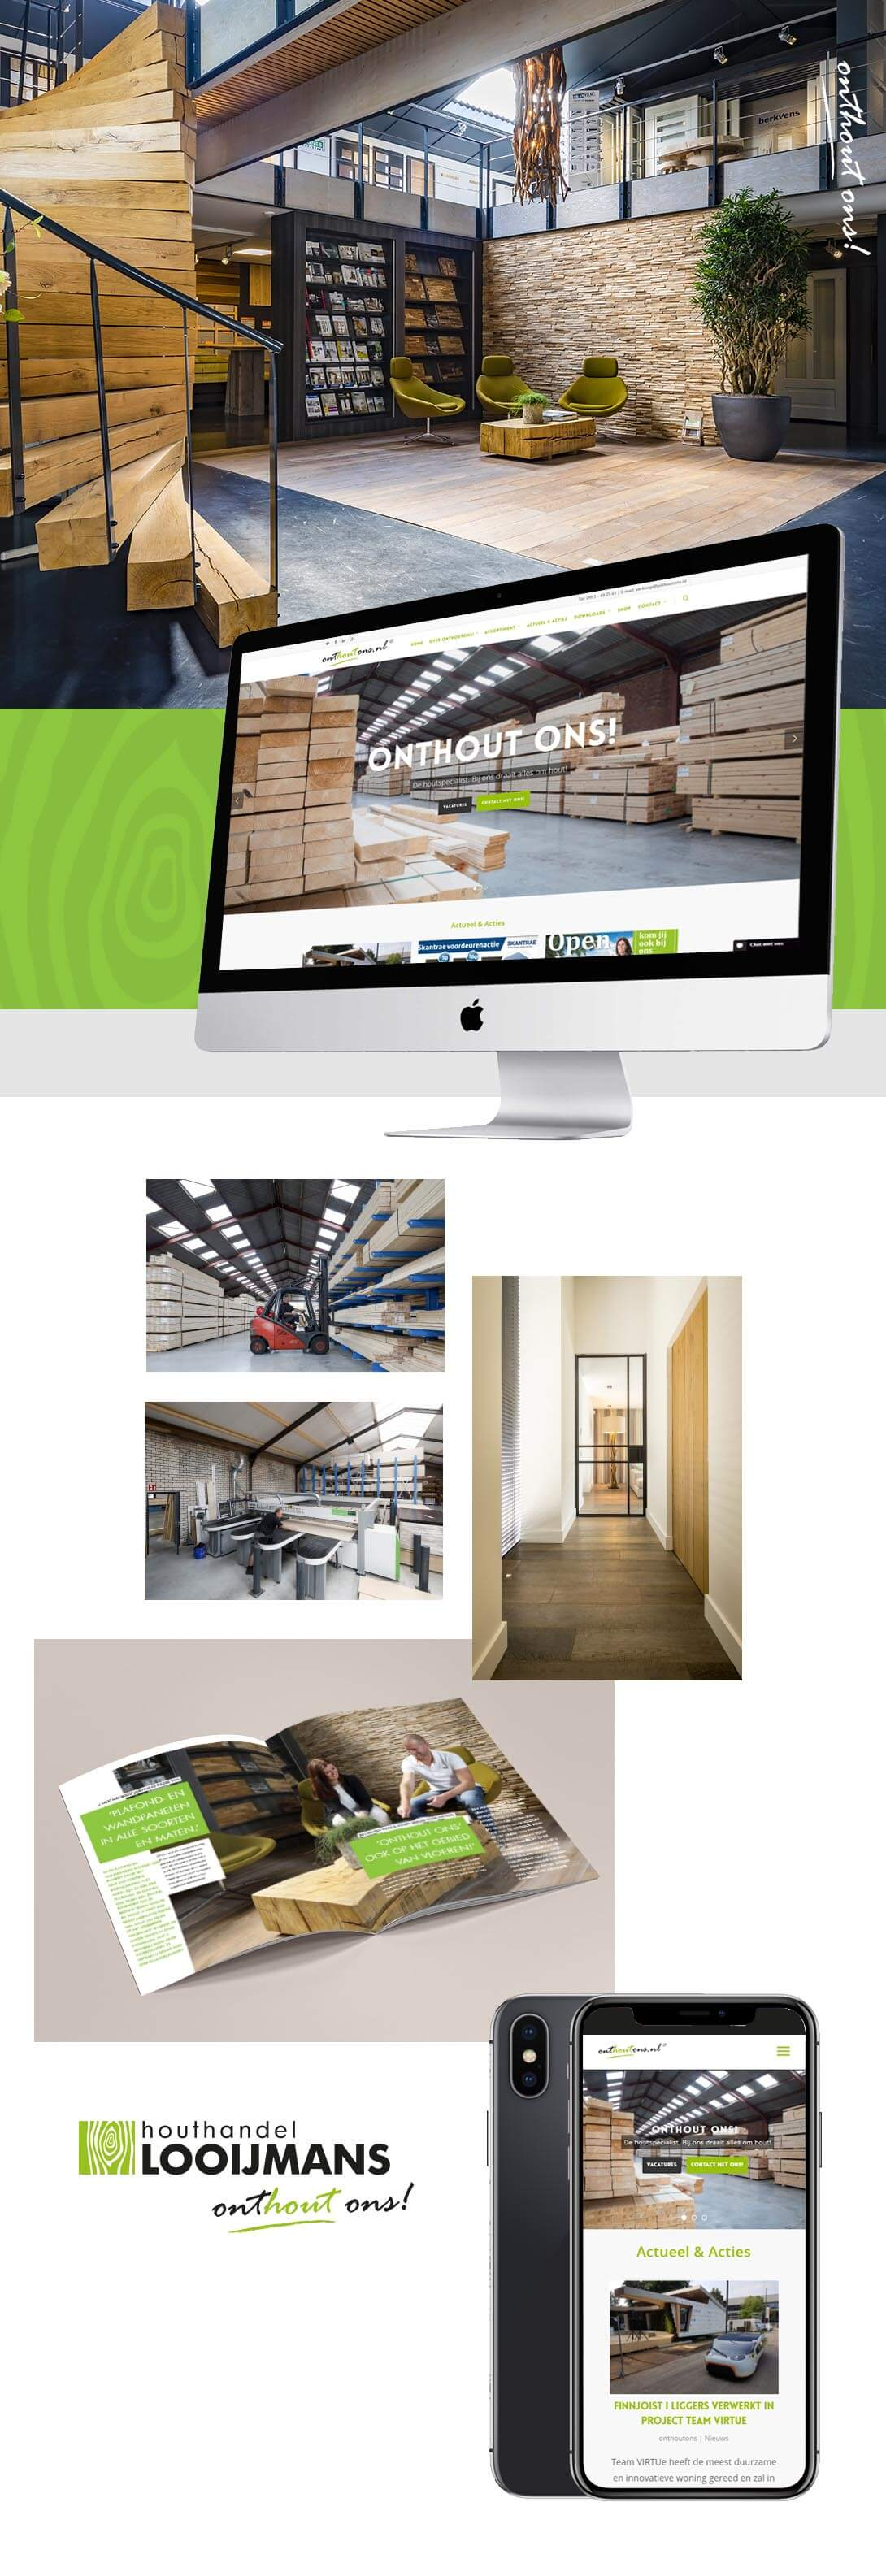 houthandel-looijmans-website-maken-internetbureau-steenstramedia